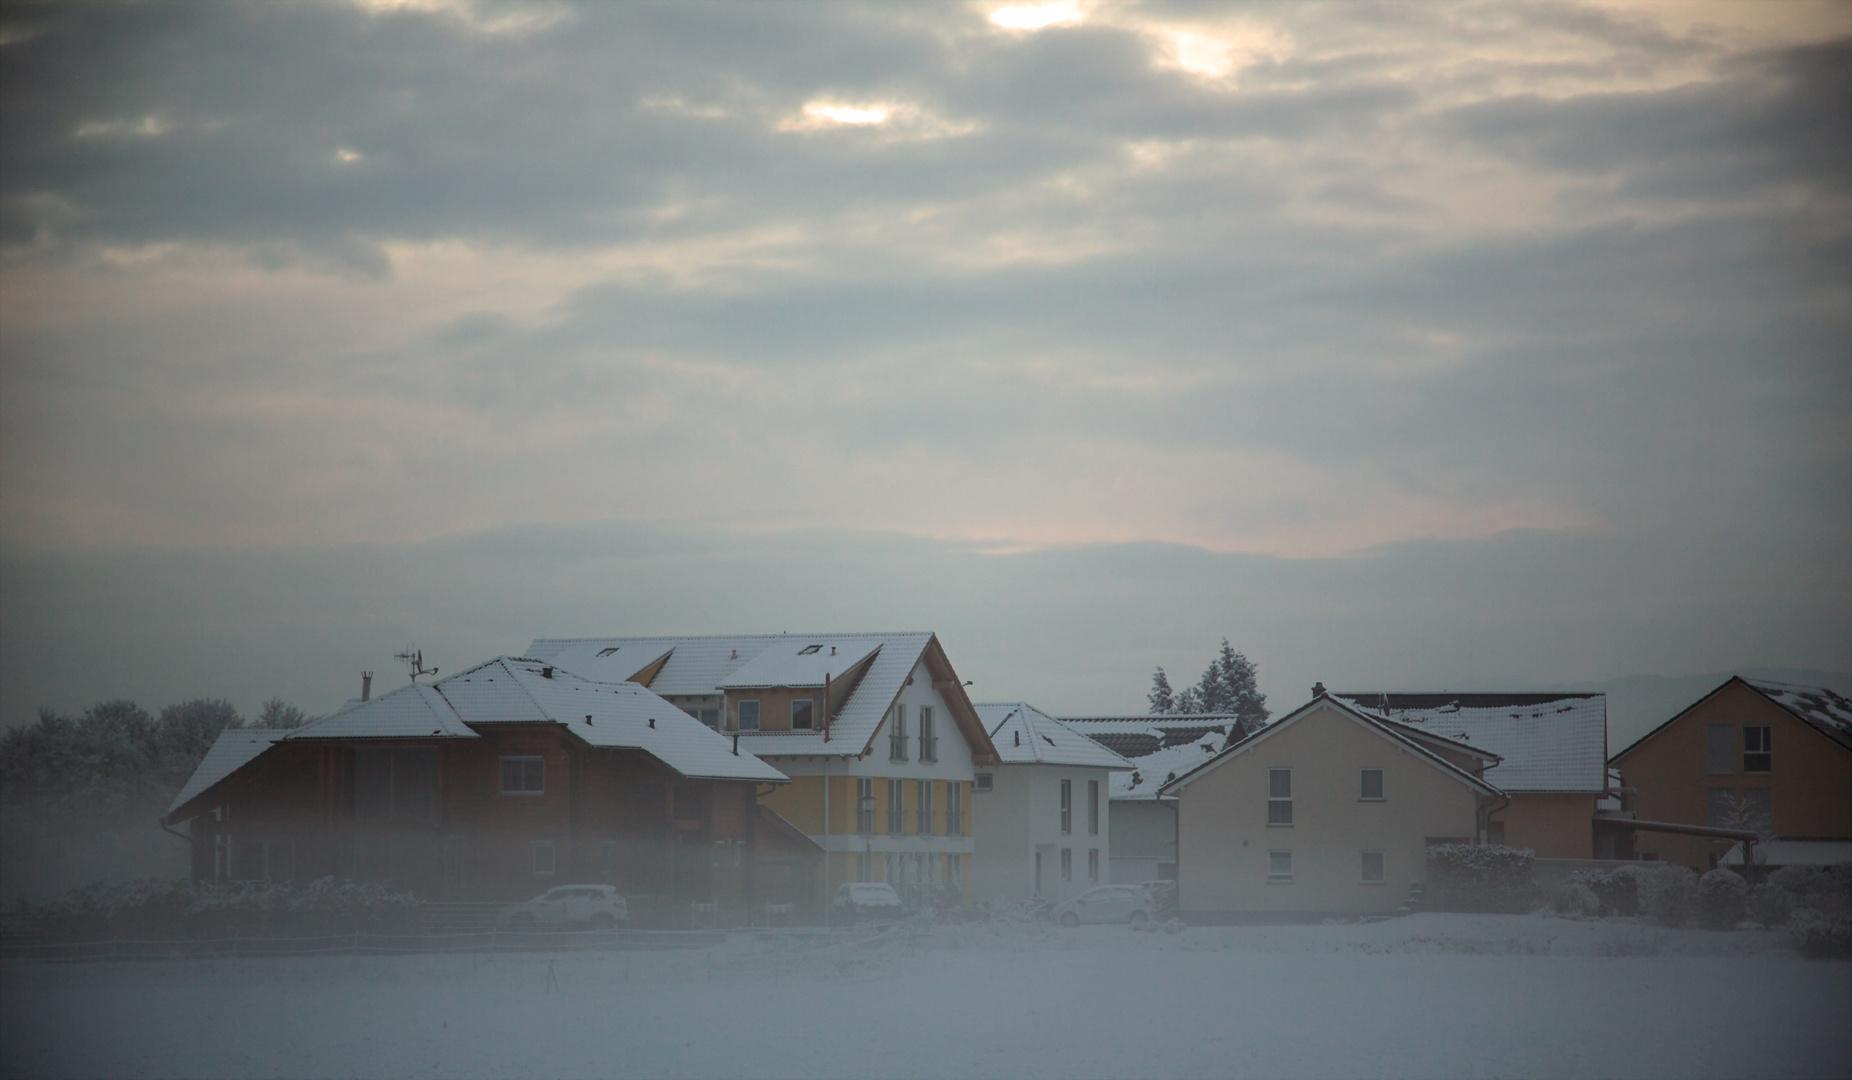 Februarnebel über dem Wohngebiet